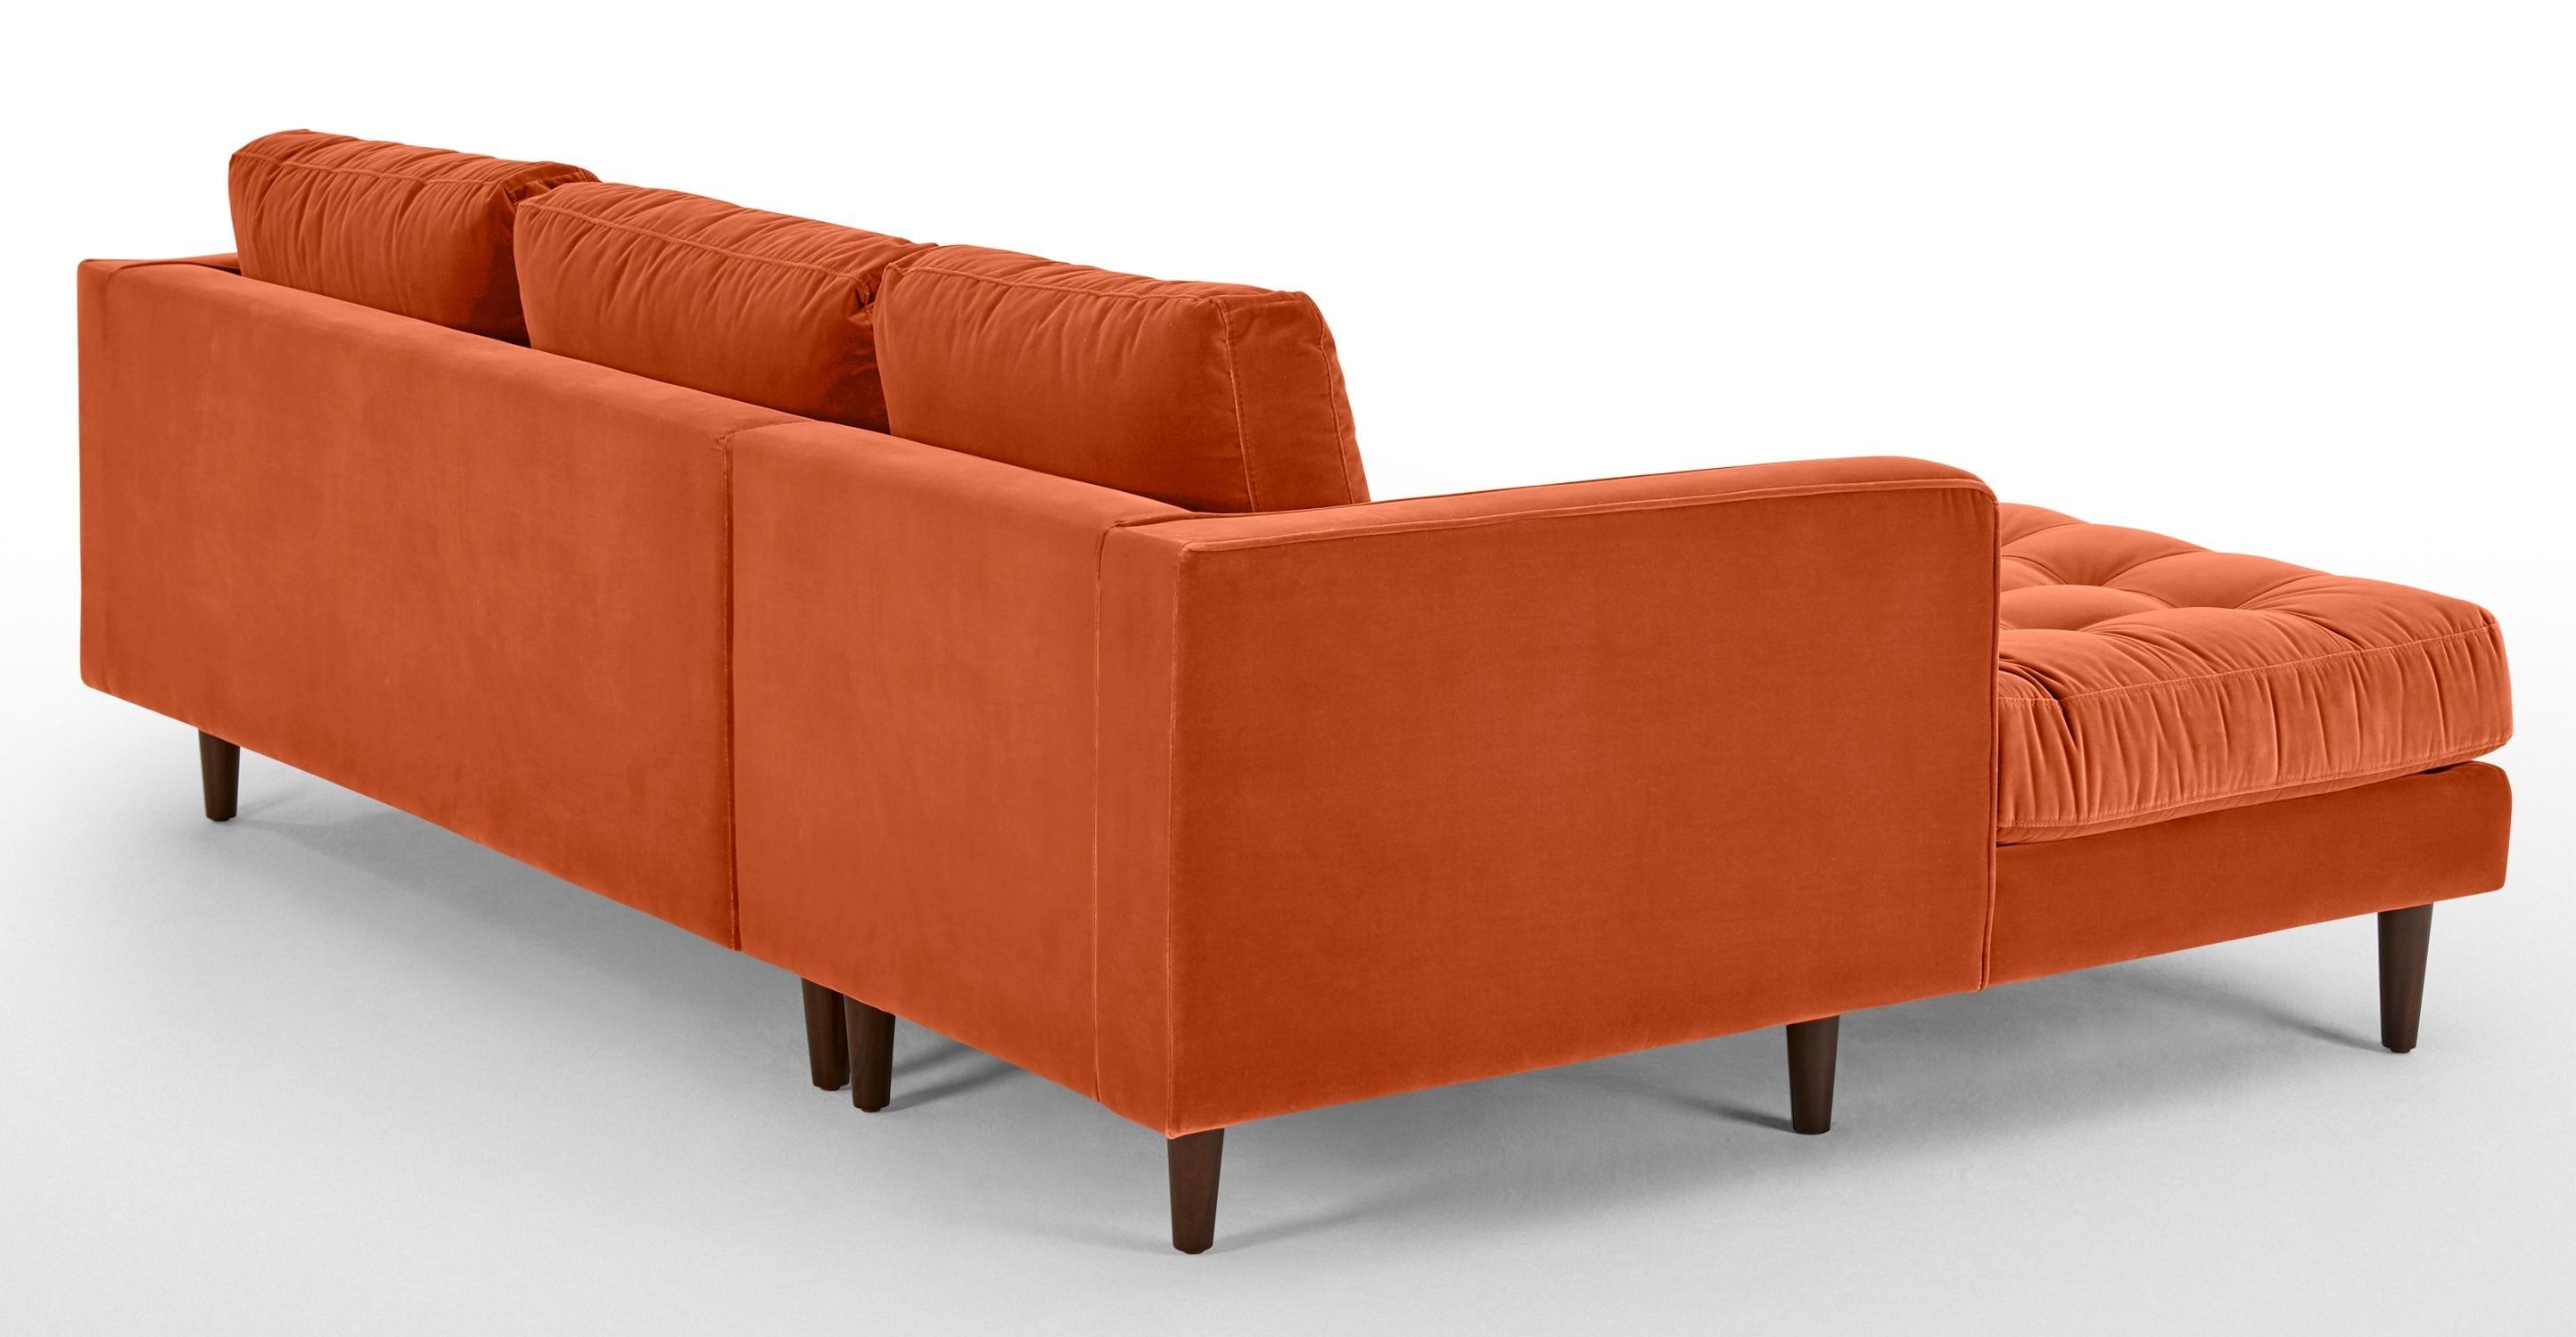 Scott 4 Seater Left Hand Facing Chaise End Sofa, Burnt Orange Within Burnt Orange Sofas (View 14 of 20)